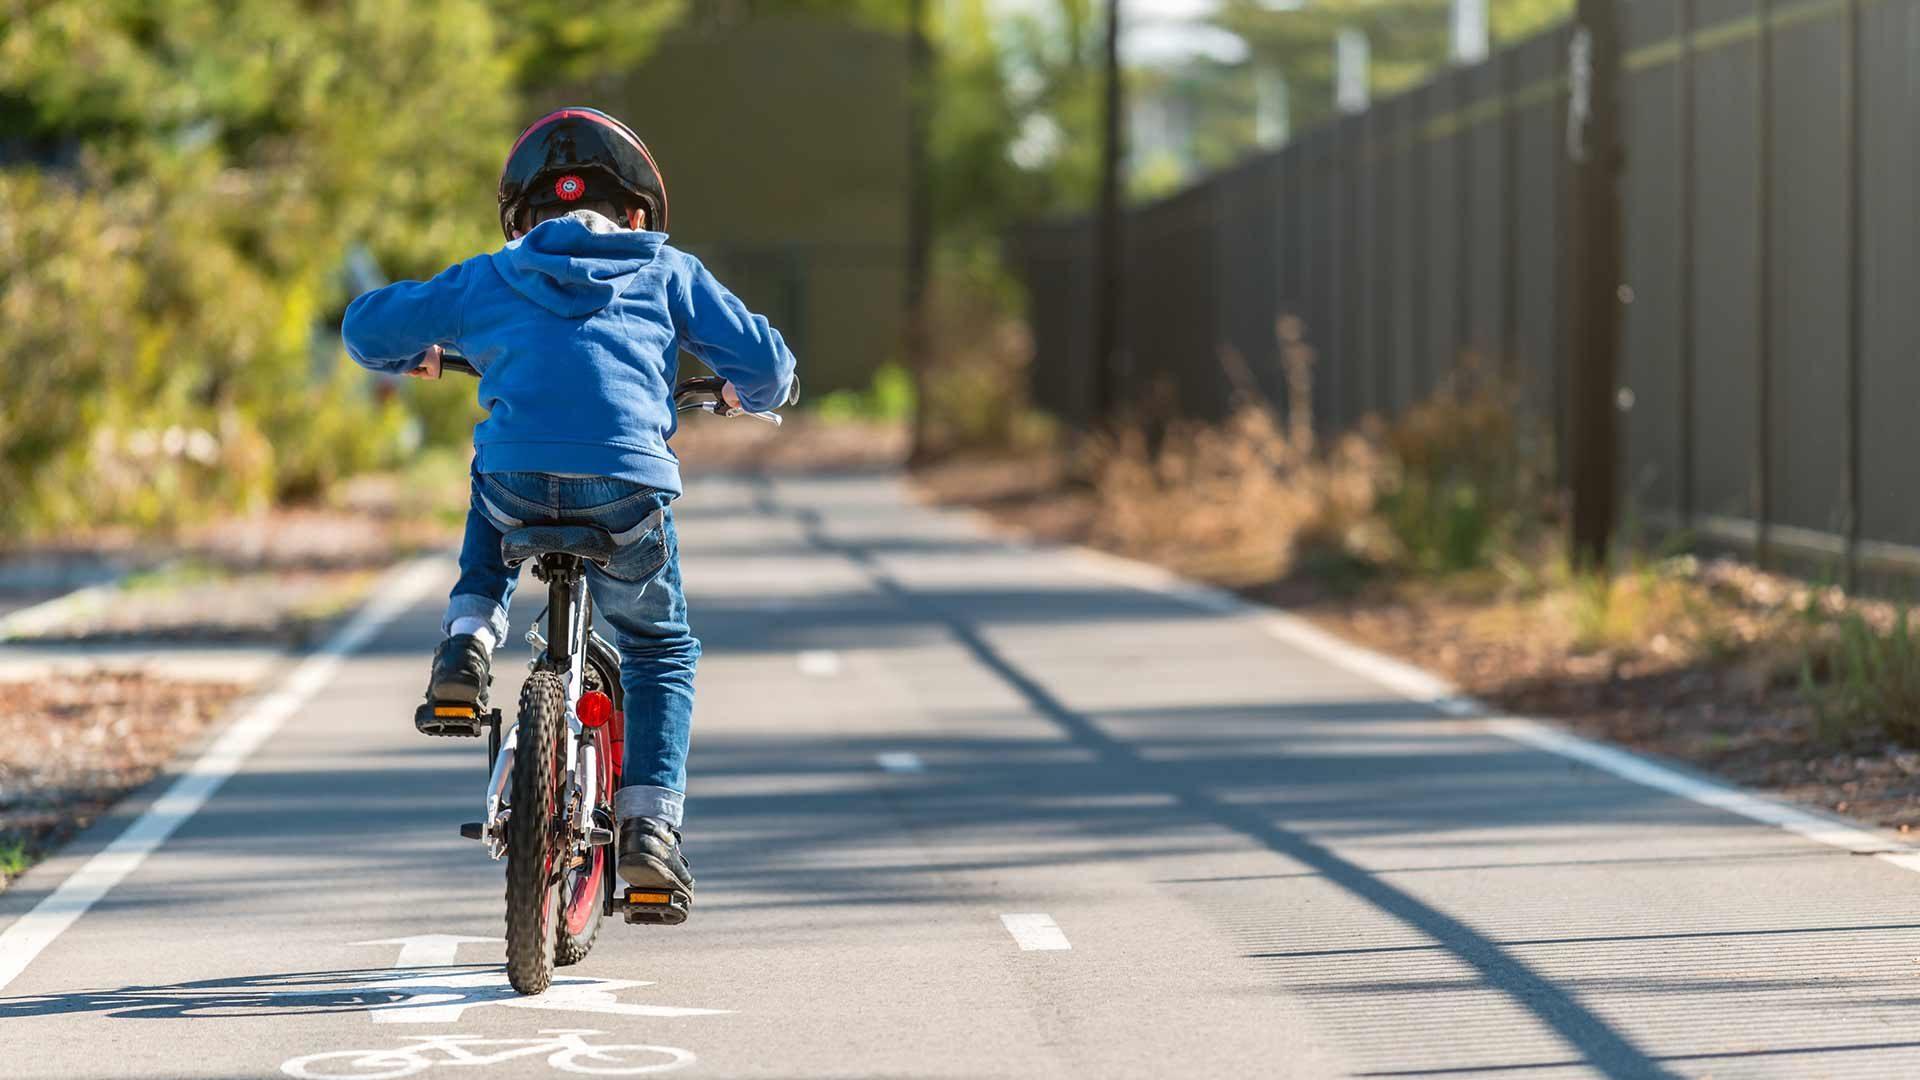 Giro in bicicletta Lana - Marlengo